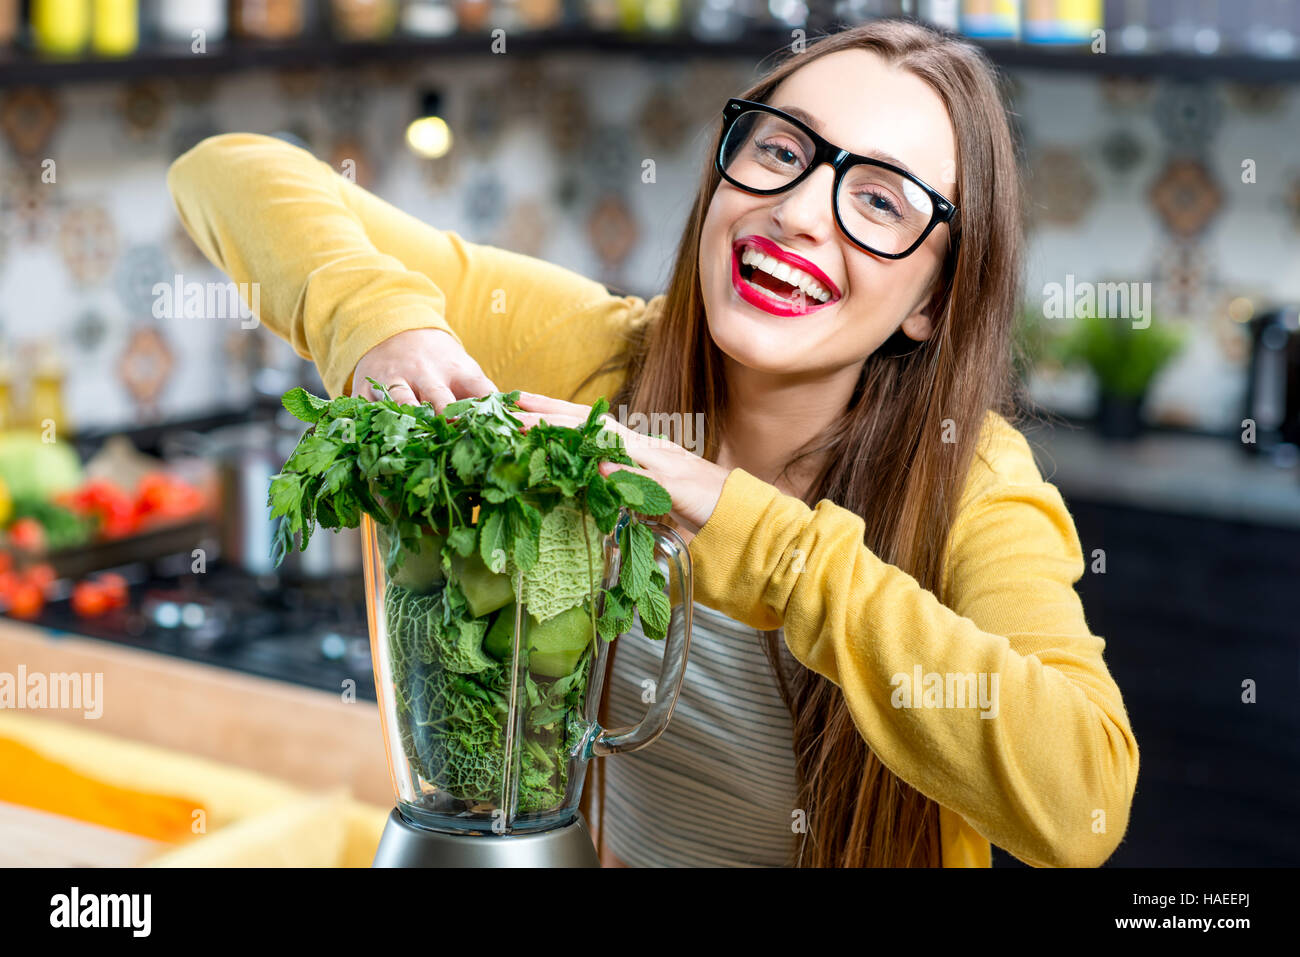 Woman making smoothie - Stock Image